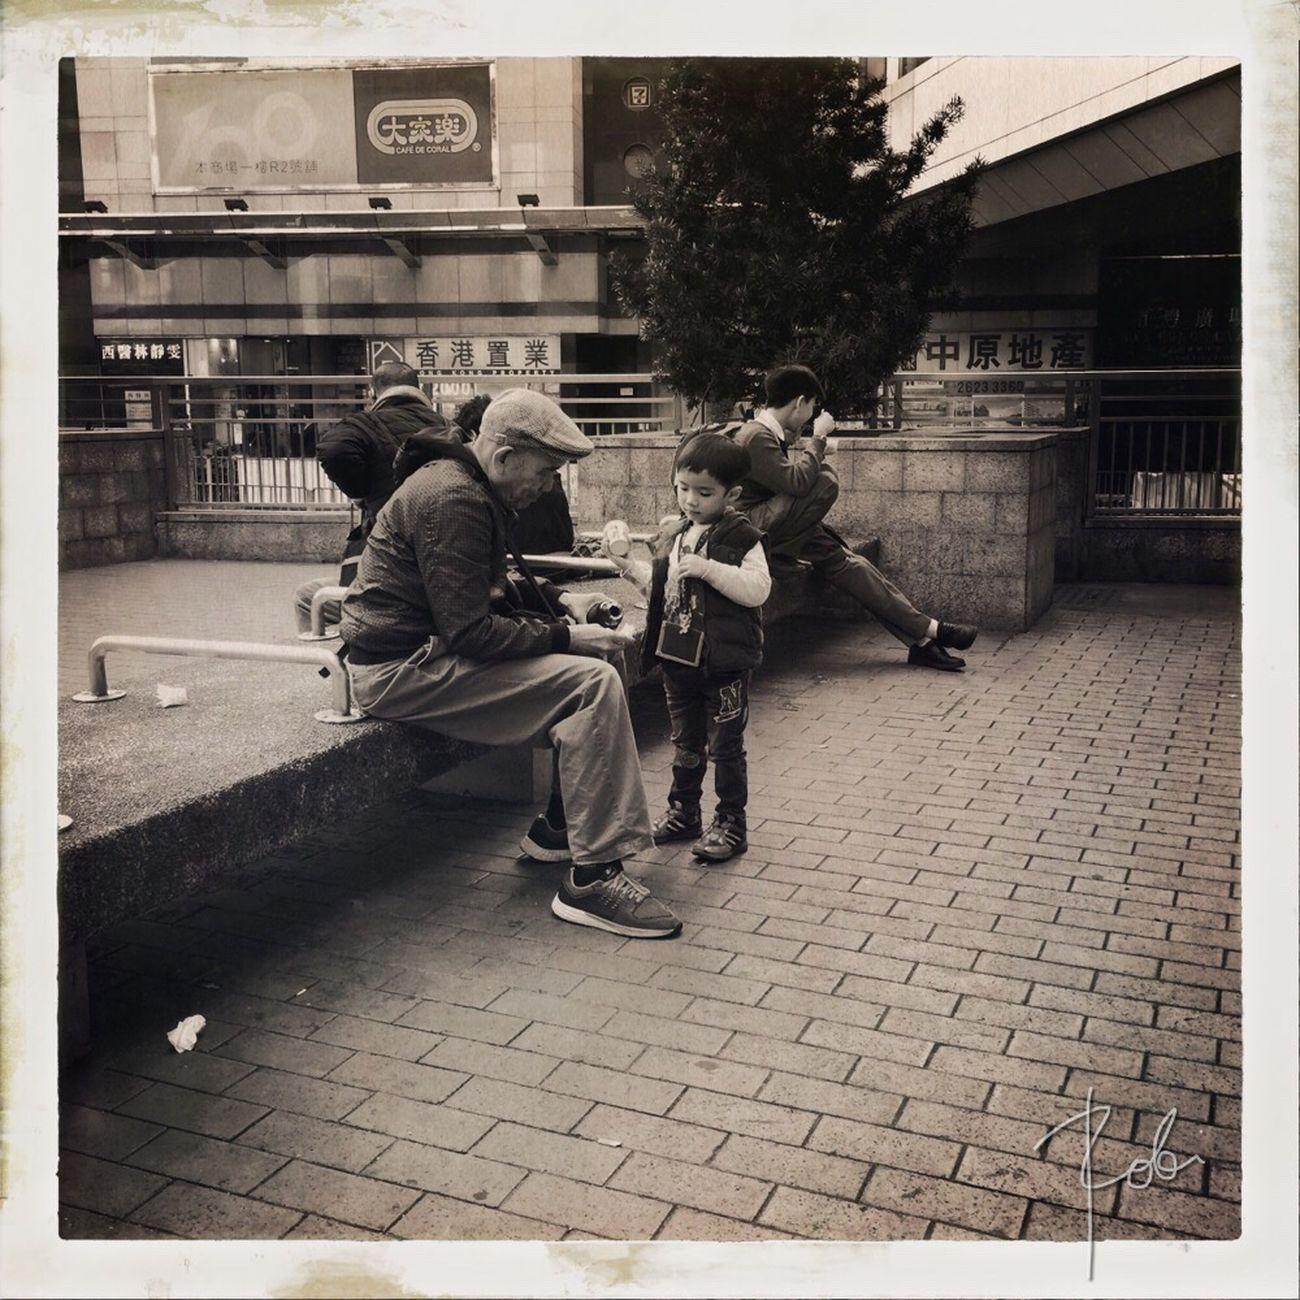 Generational Real People City Street Streetphotography Streetphoto_bw IPhoneography NEM GoodKarma AMPt_community NEM Street Hong Kong AMPt - Street Theappwhisperer Eyeem Philippines Monochrome Hipstamatic